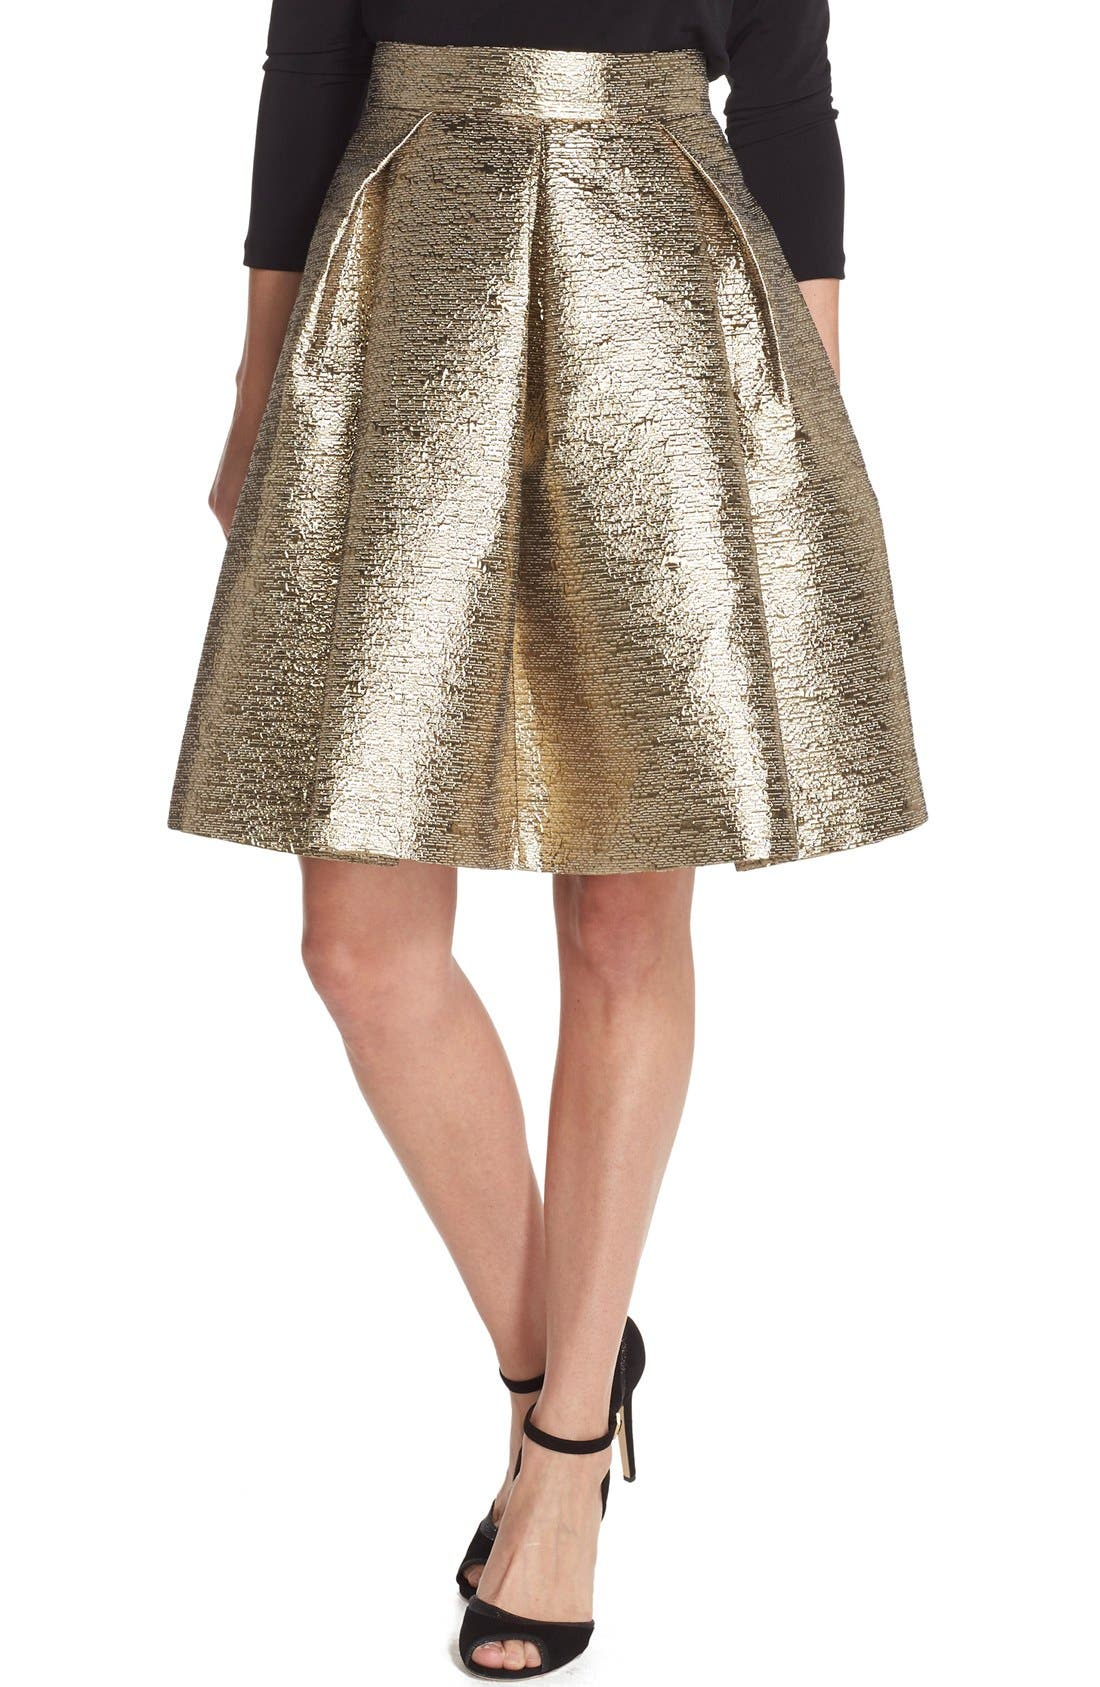 Alternate Image 1 Selected - Eliza J Metallic Jacquard Flared Skirt